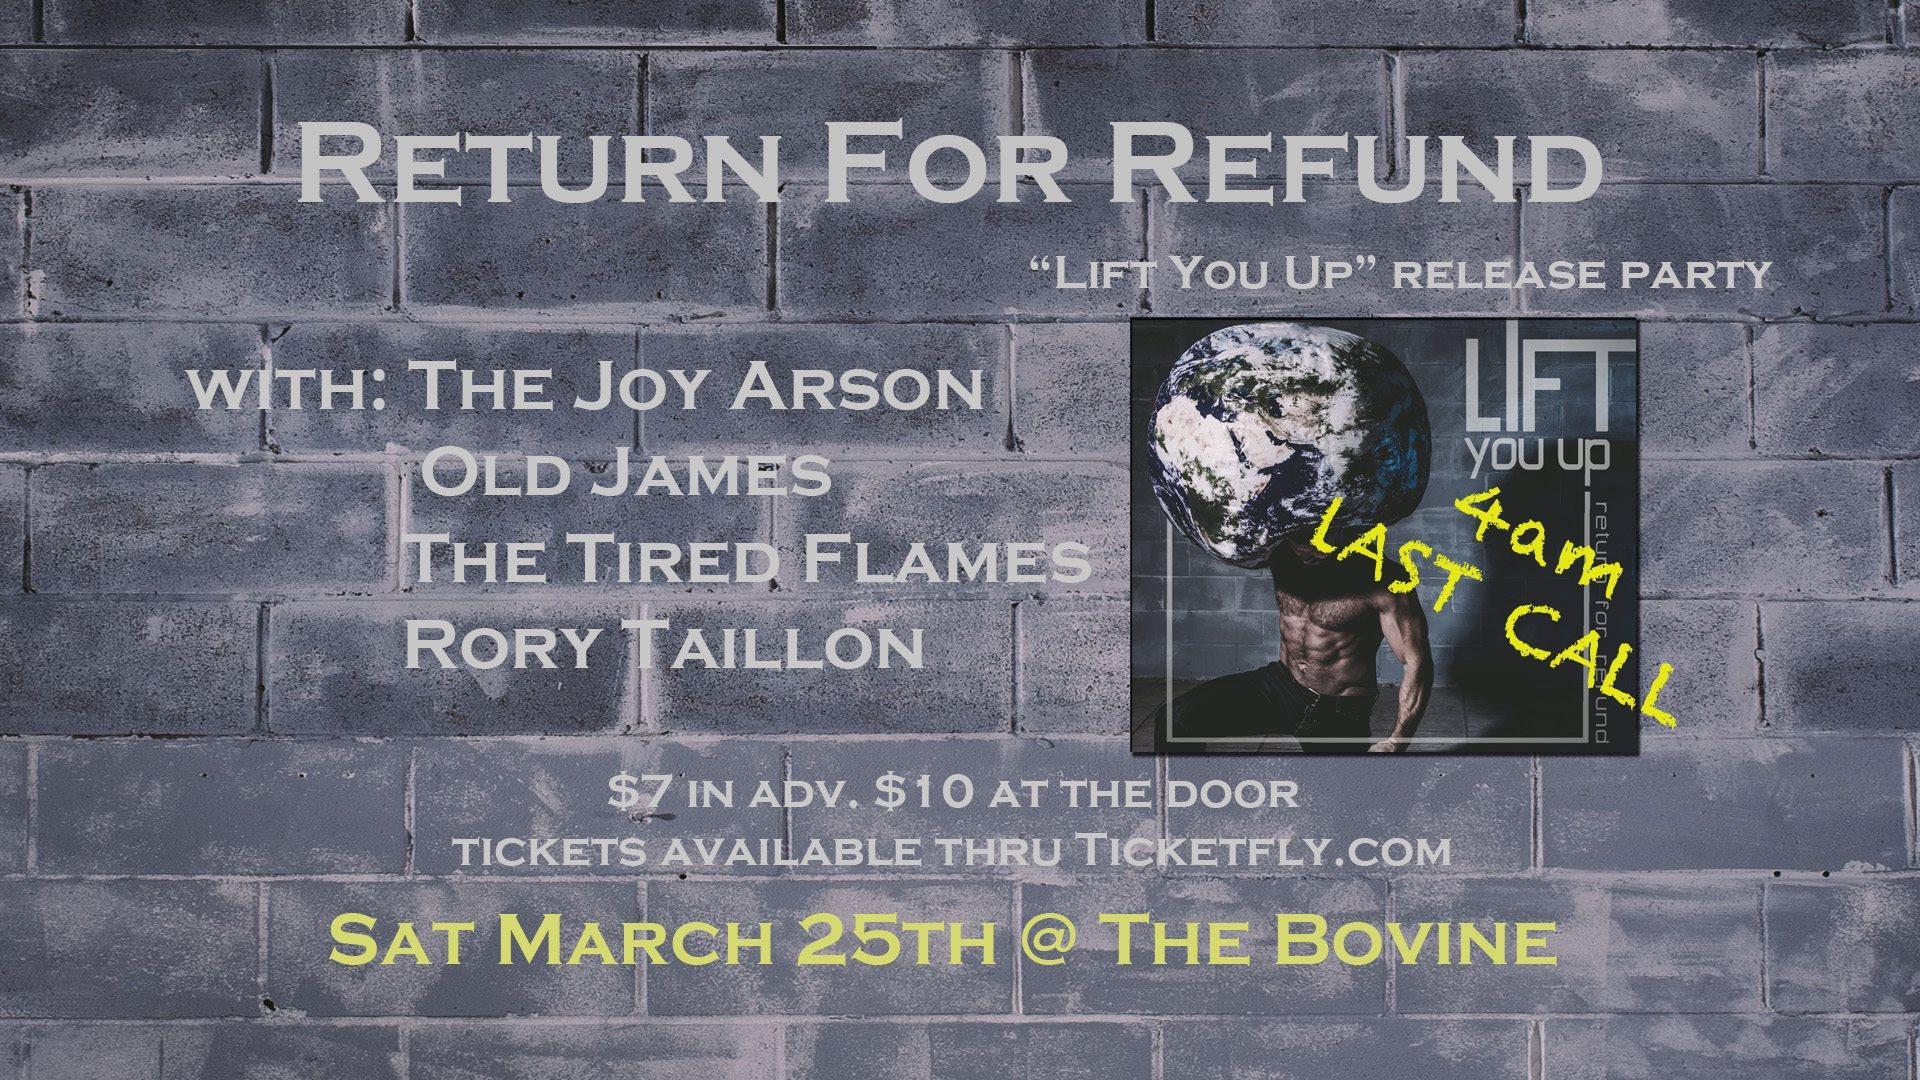 Return for Refund * 4am Last Call*